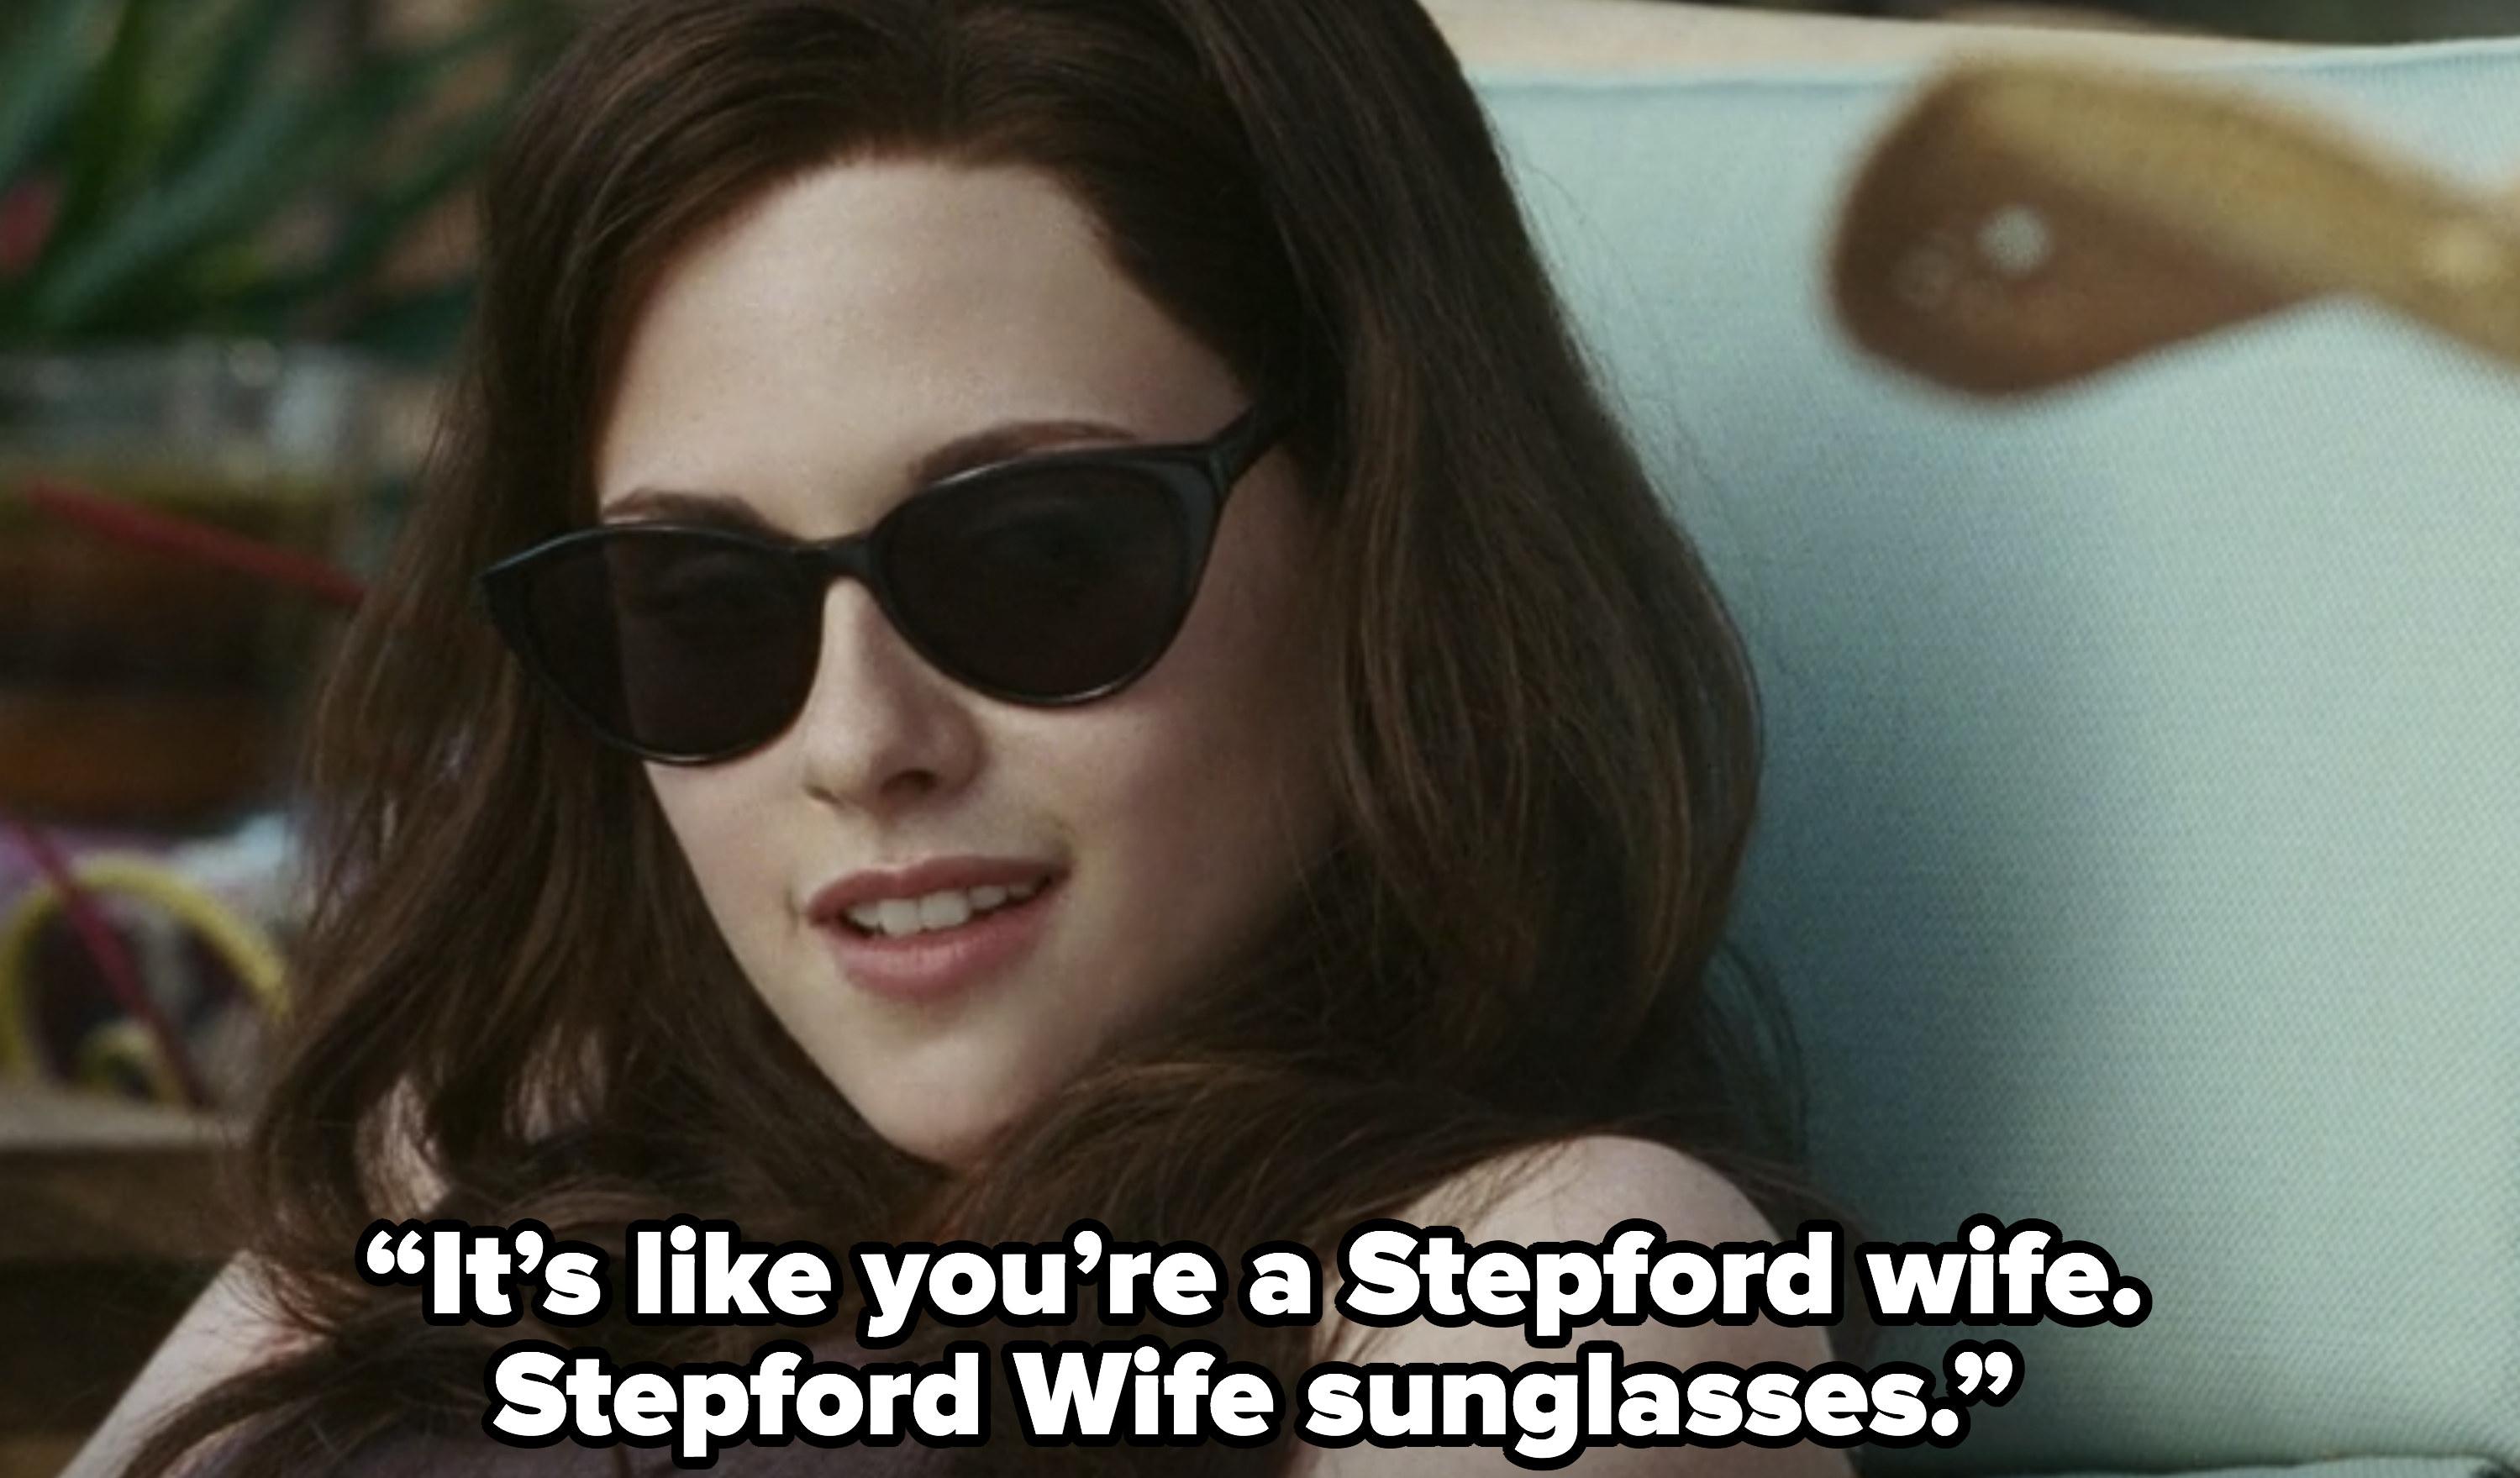 It's like you're a Stepford wife. Stepford Wife sunglasses